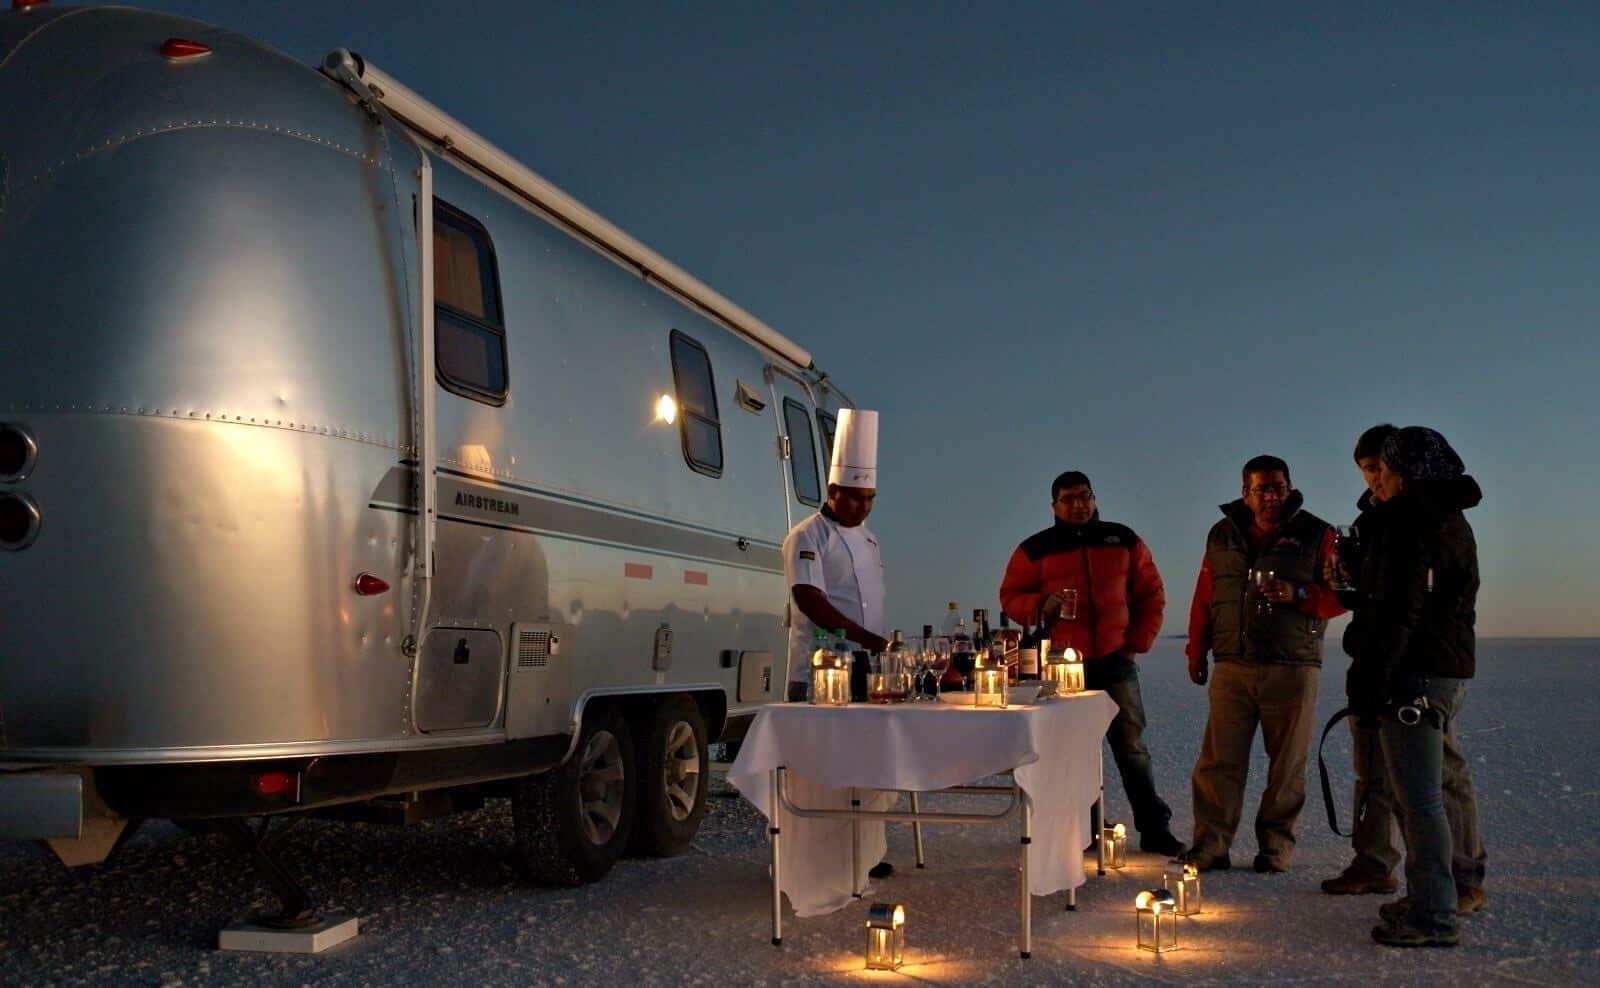 bolivien_Salar_de_Uyuni_air-stream-camper-Aperitif